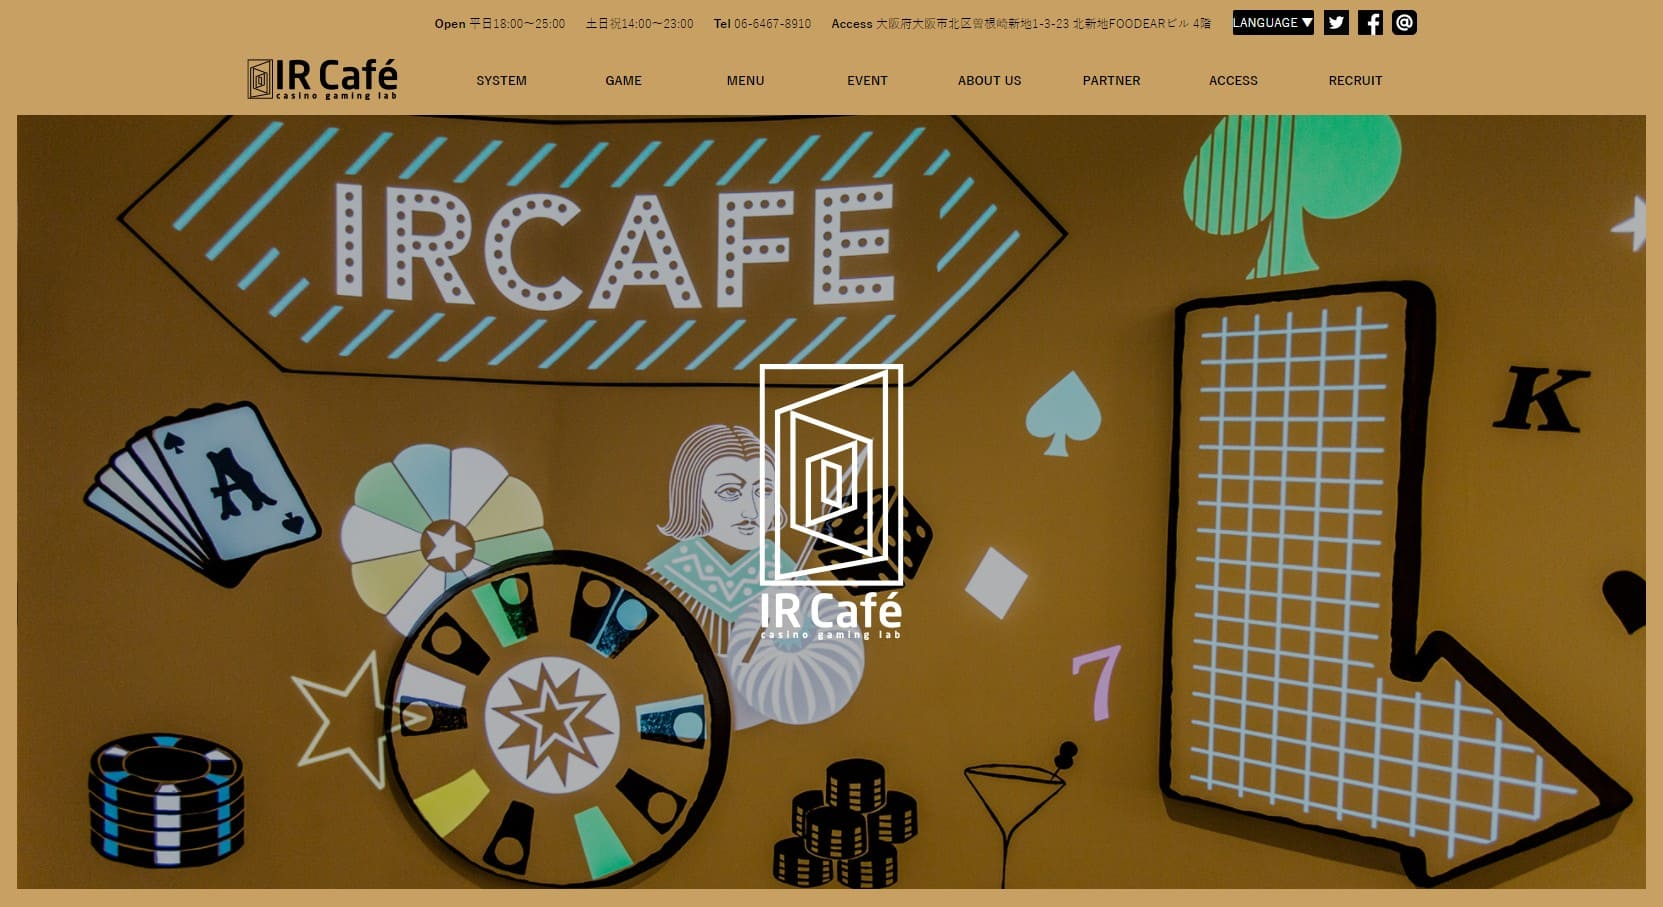 IR Cafeのウェブサイト画像。